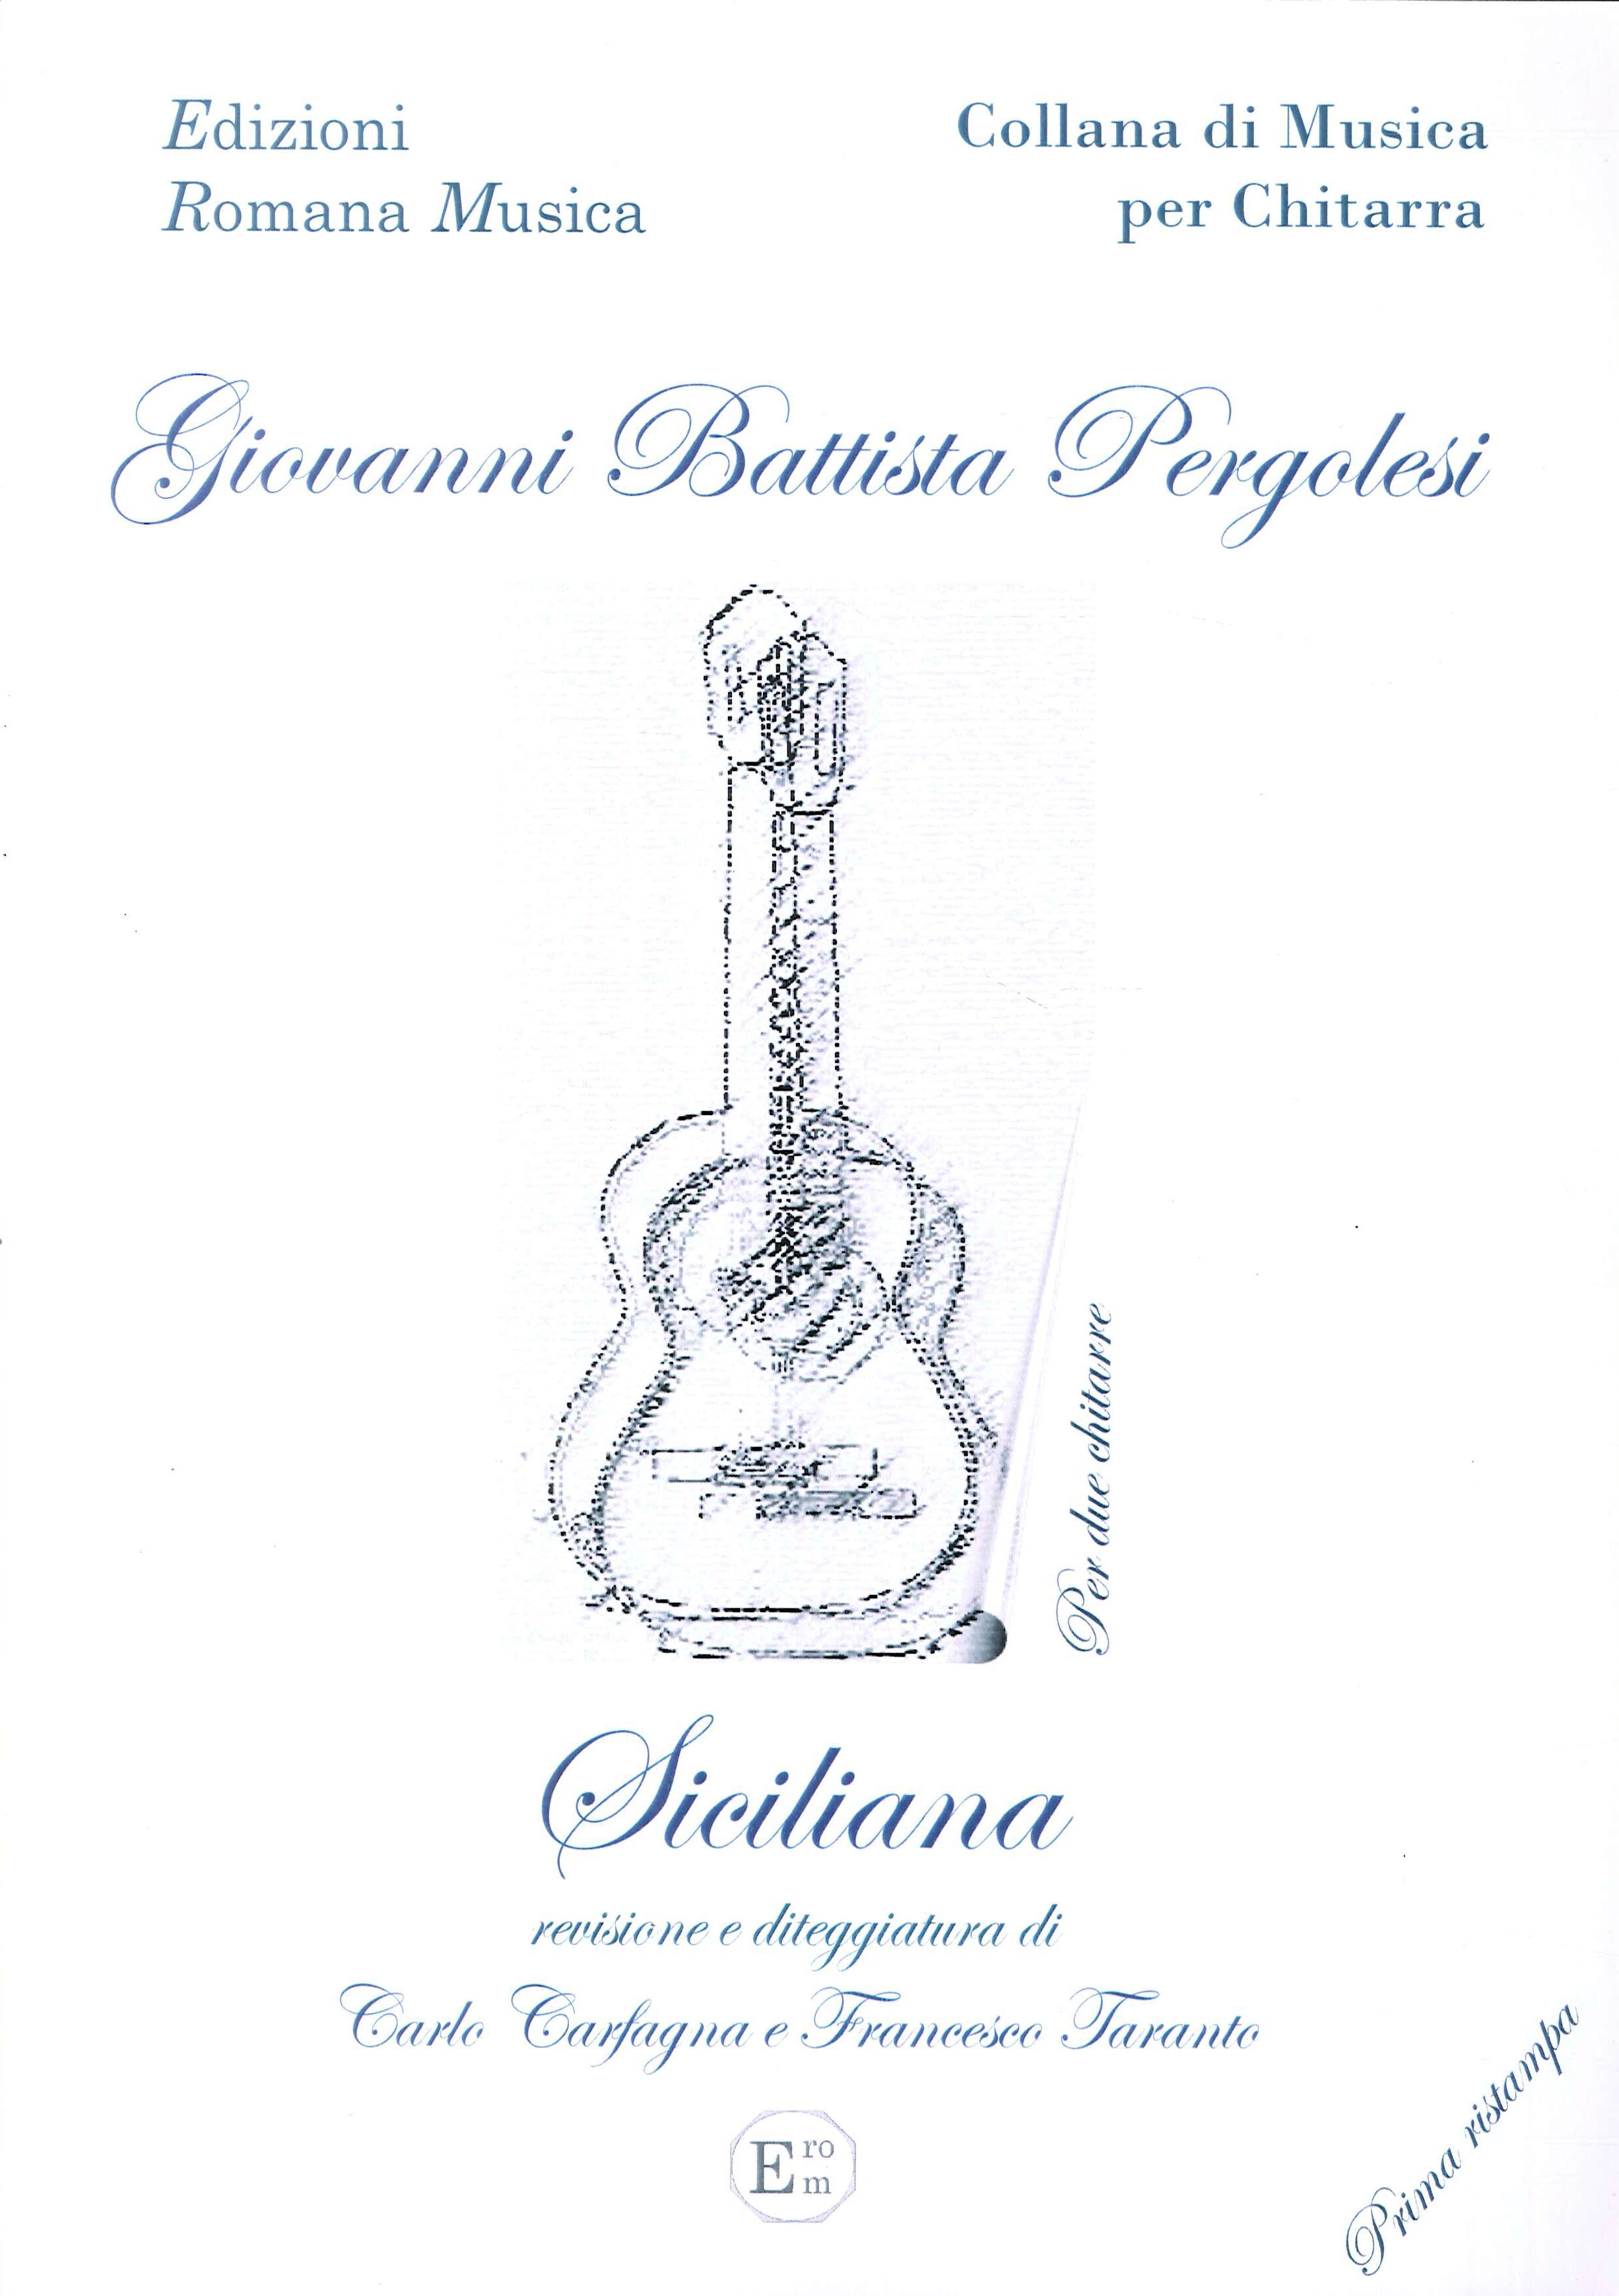 Vanni Battista Pergolesi. Siciliana. Musica per Chitarra. Erom 0040.